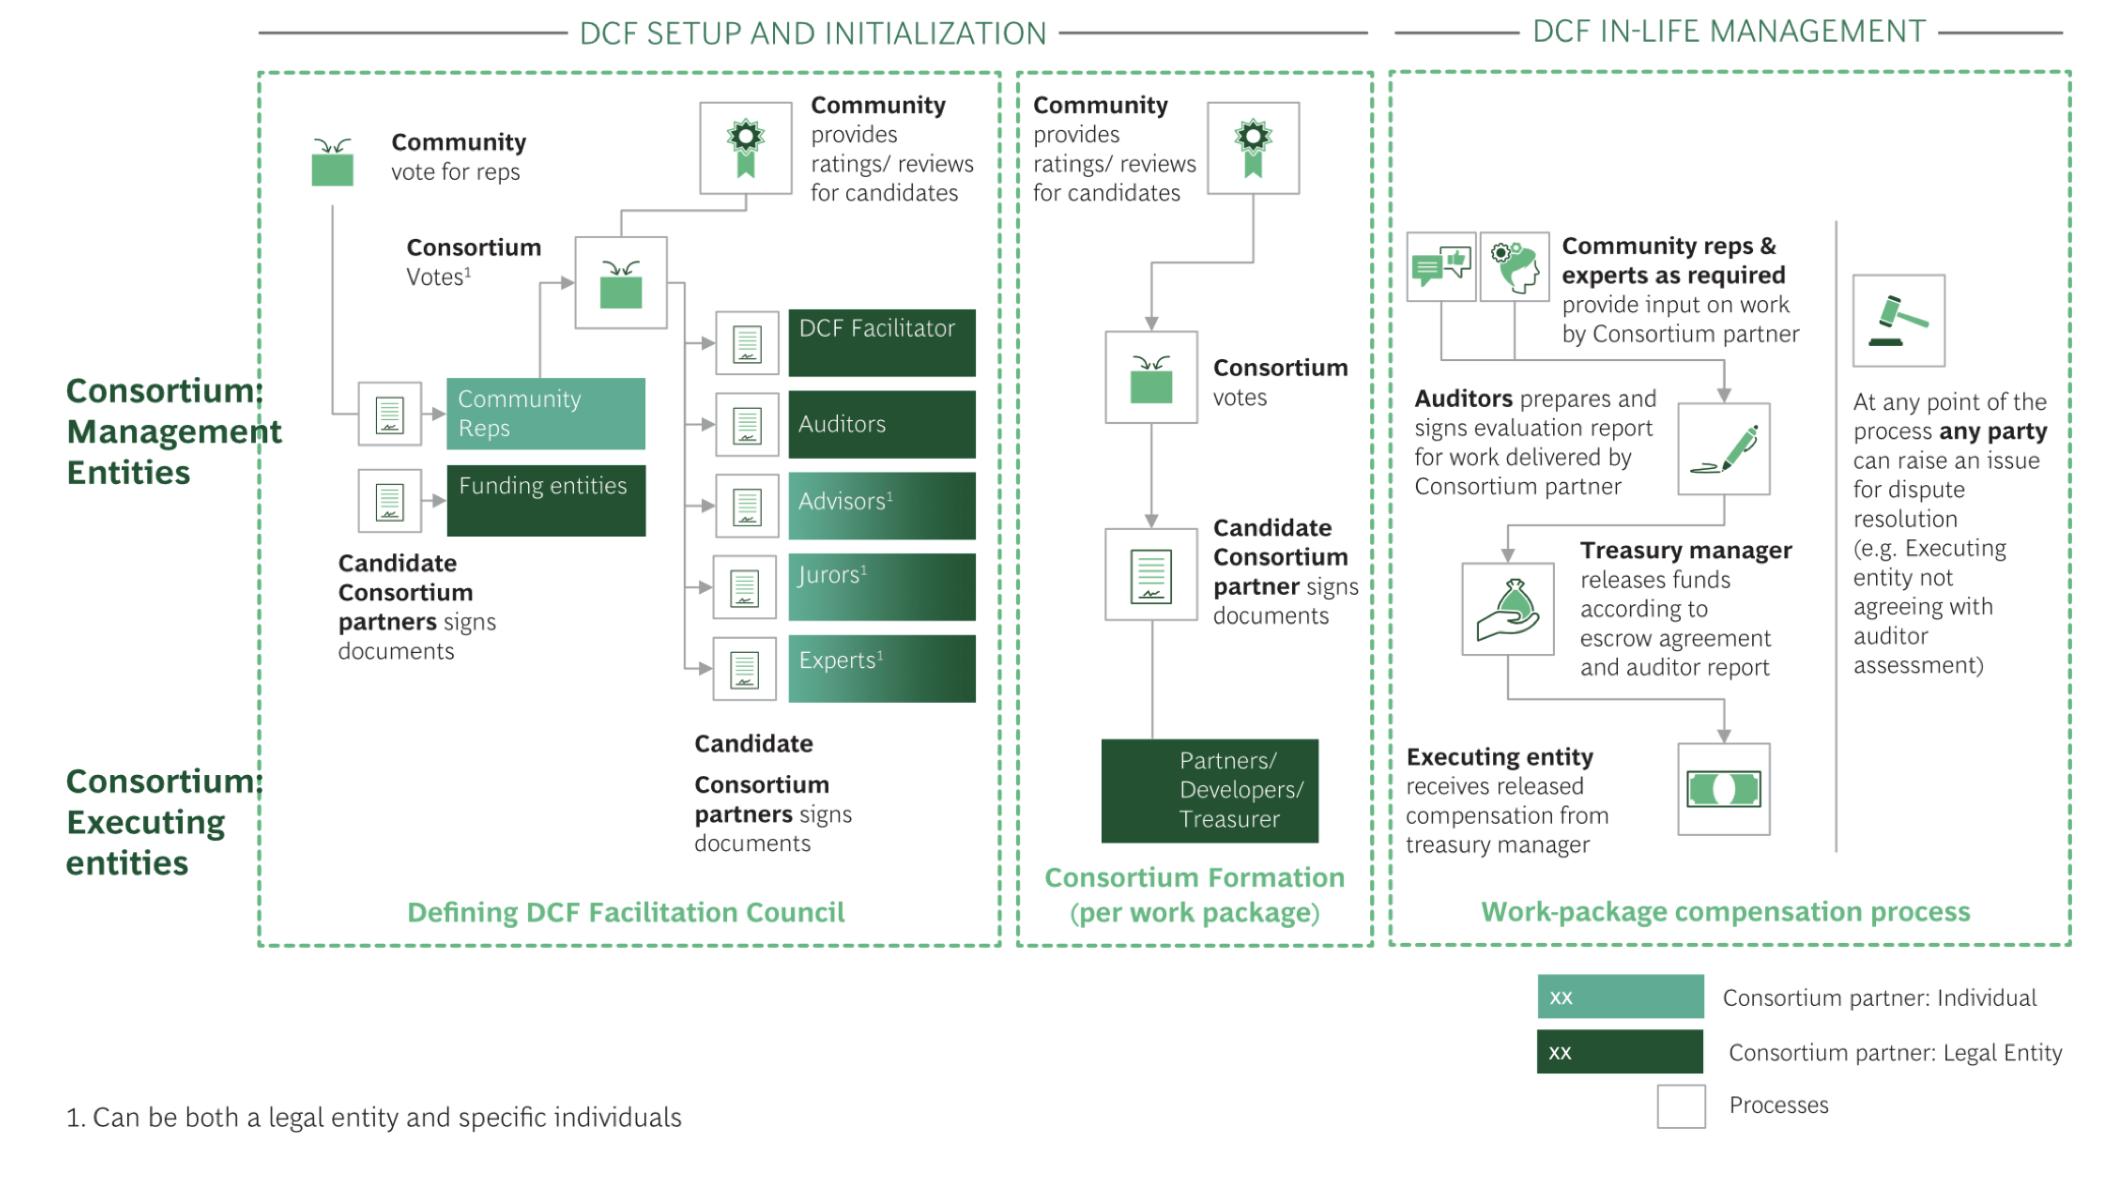 Figure 3. Consortium set-up and management